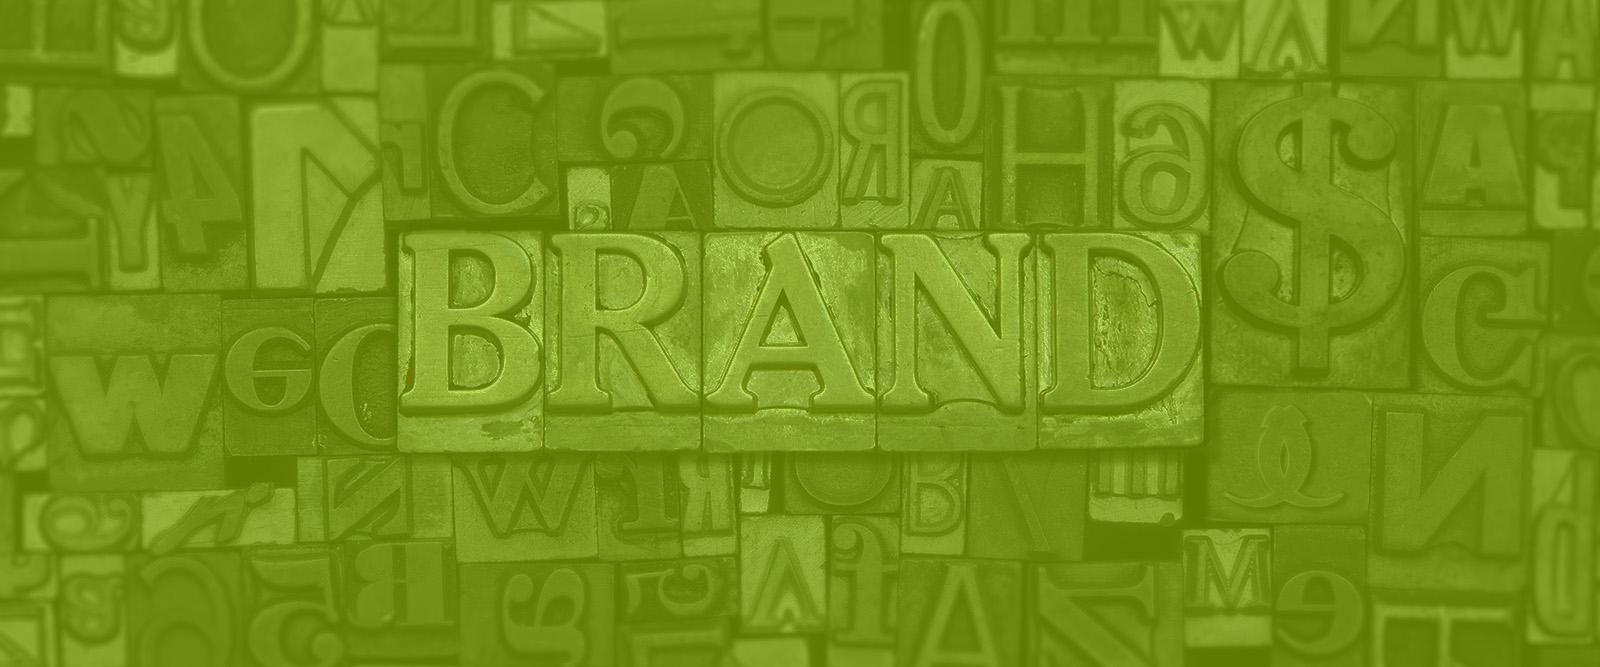 Brand Creation and Management logo design